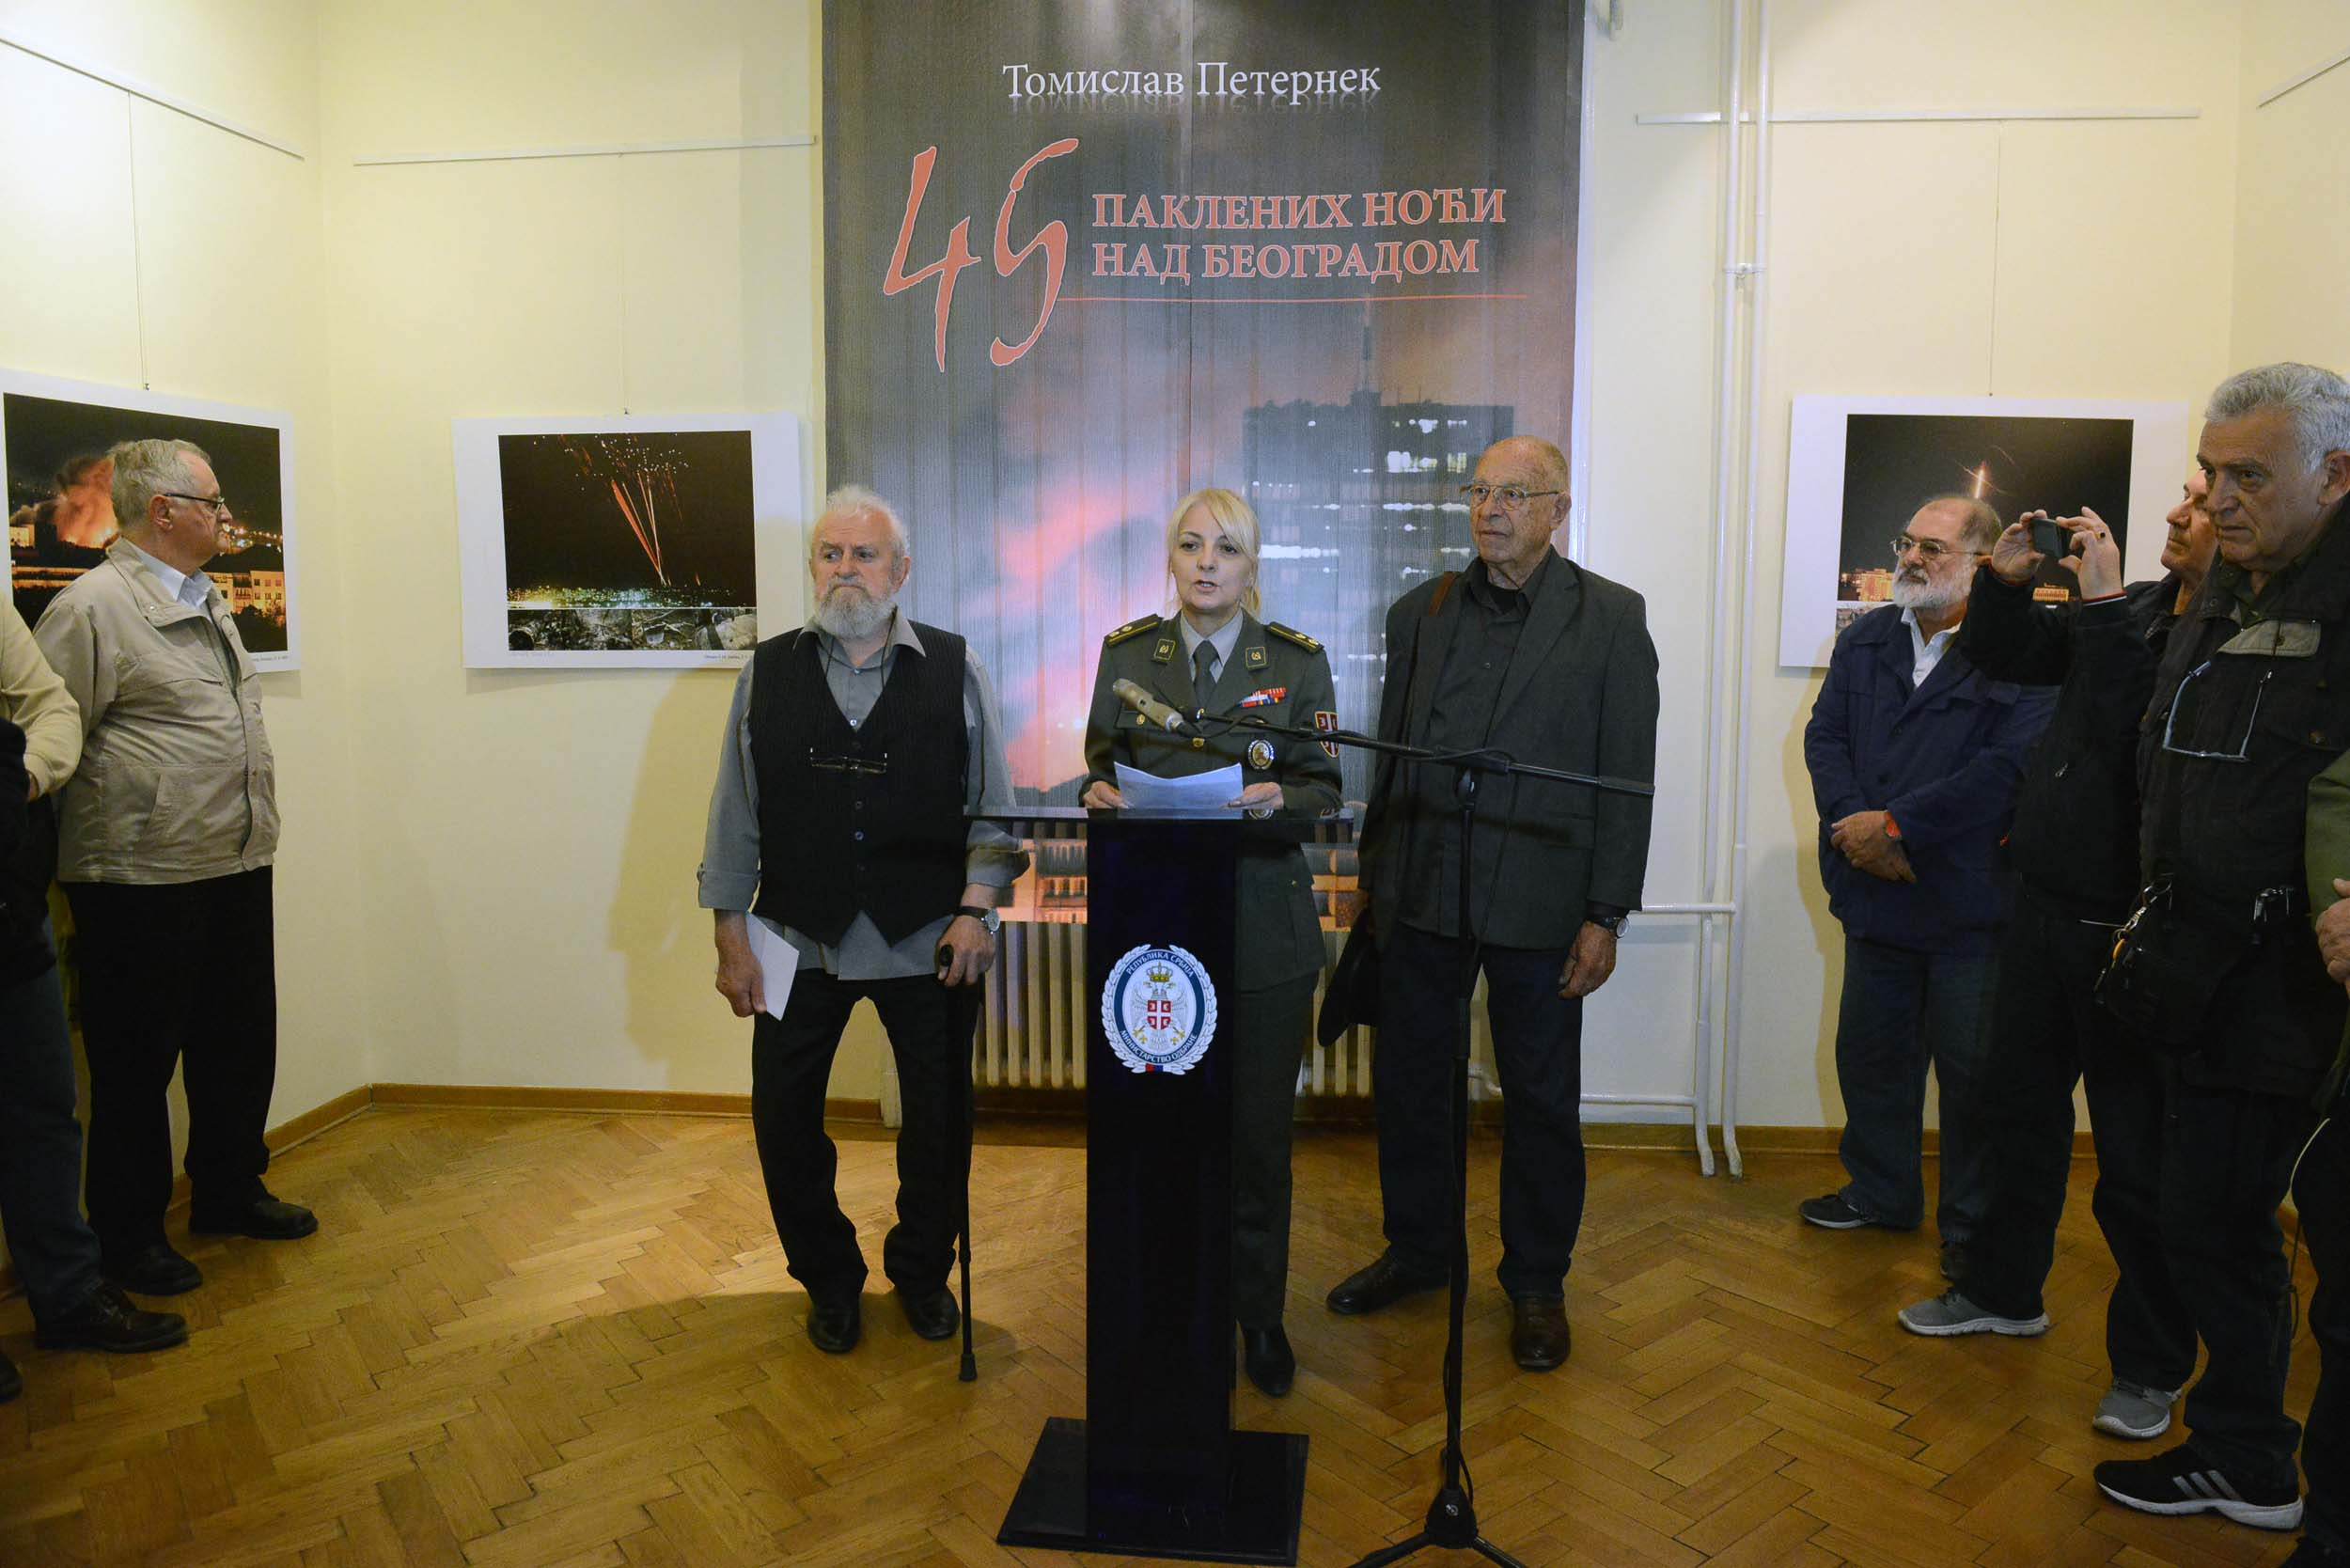 "Izložba ""45 paklenih noći nad Beogradom"" pred beogradskom publikom"